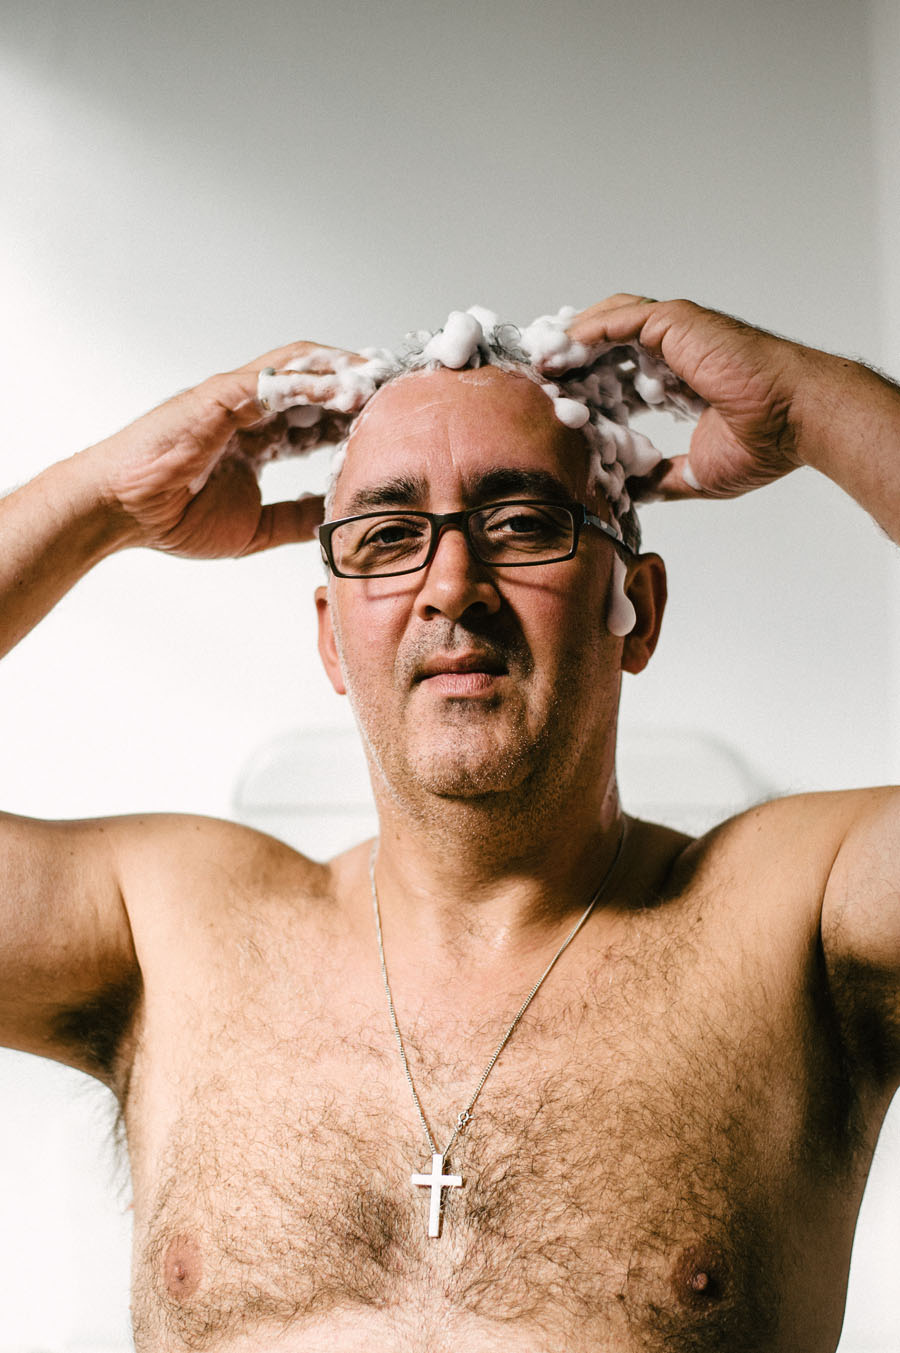 Melbourne advertising portrait photographer